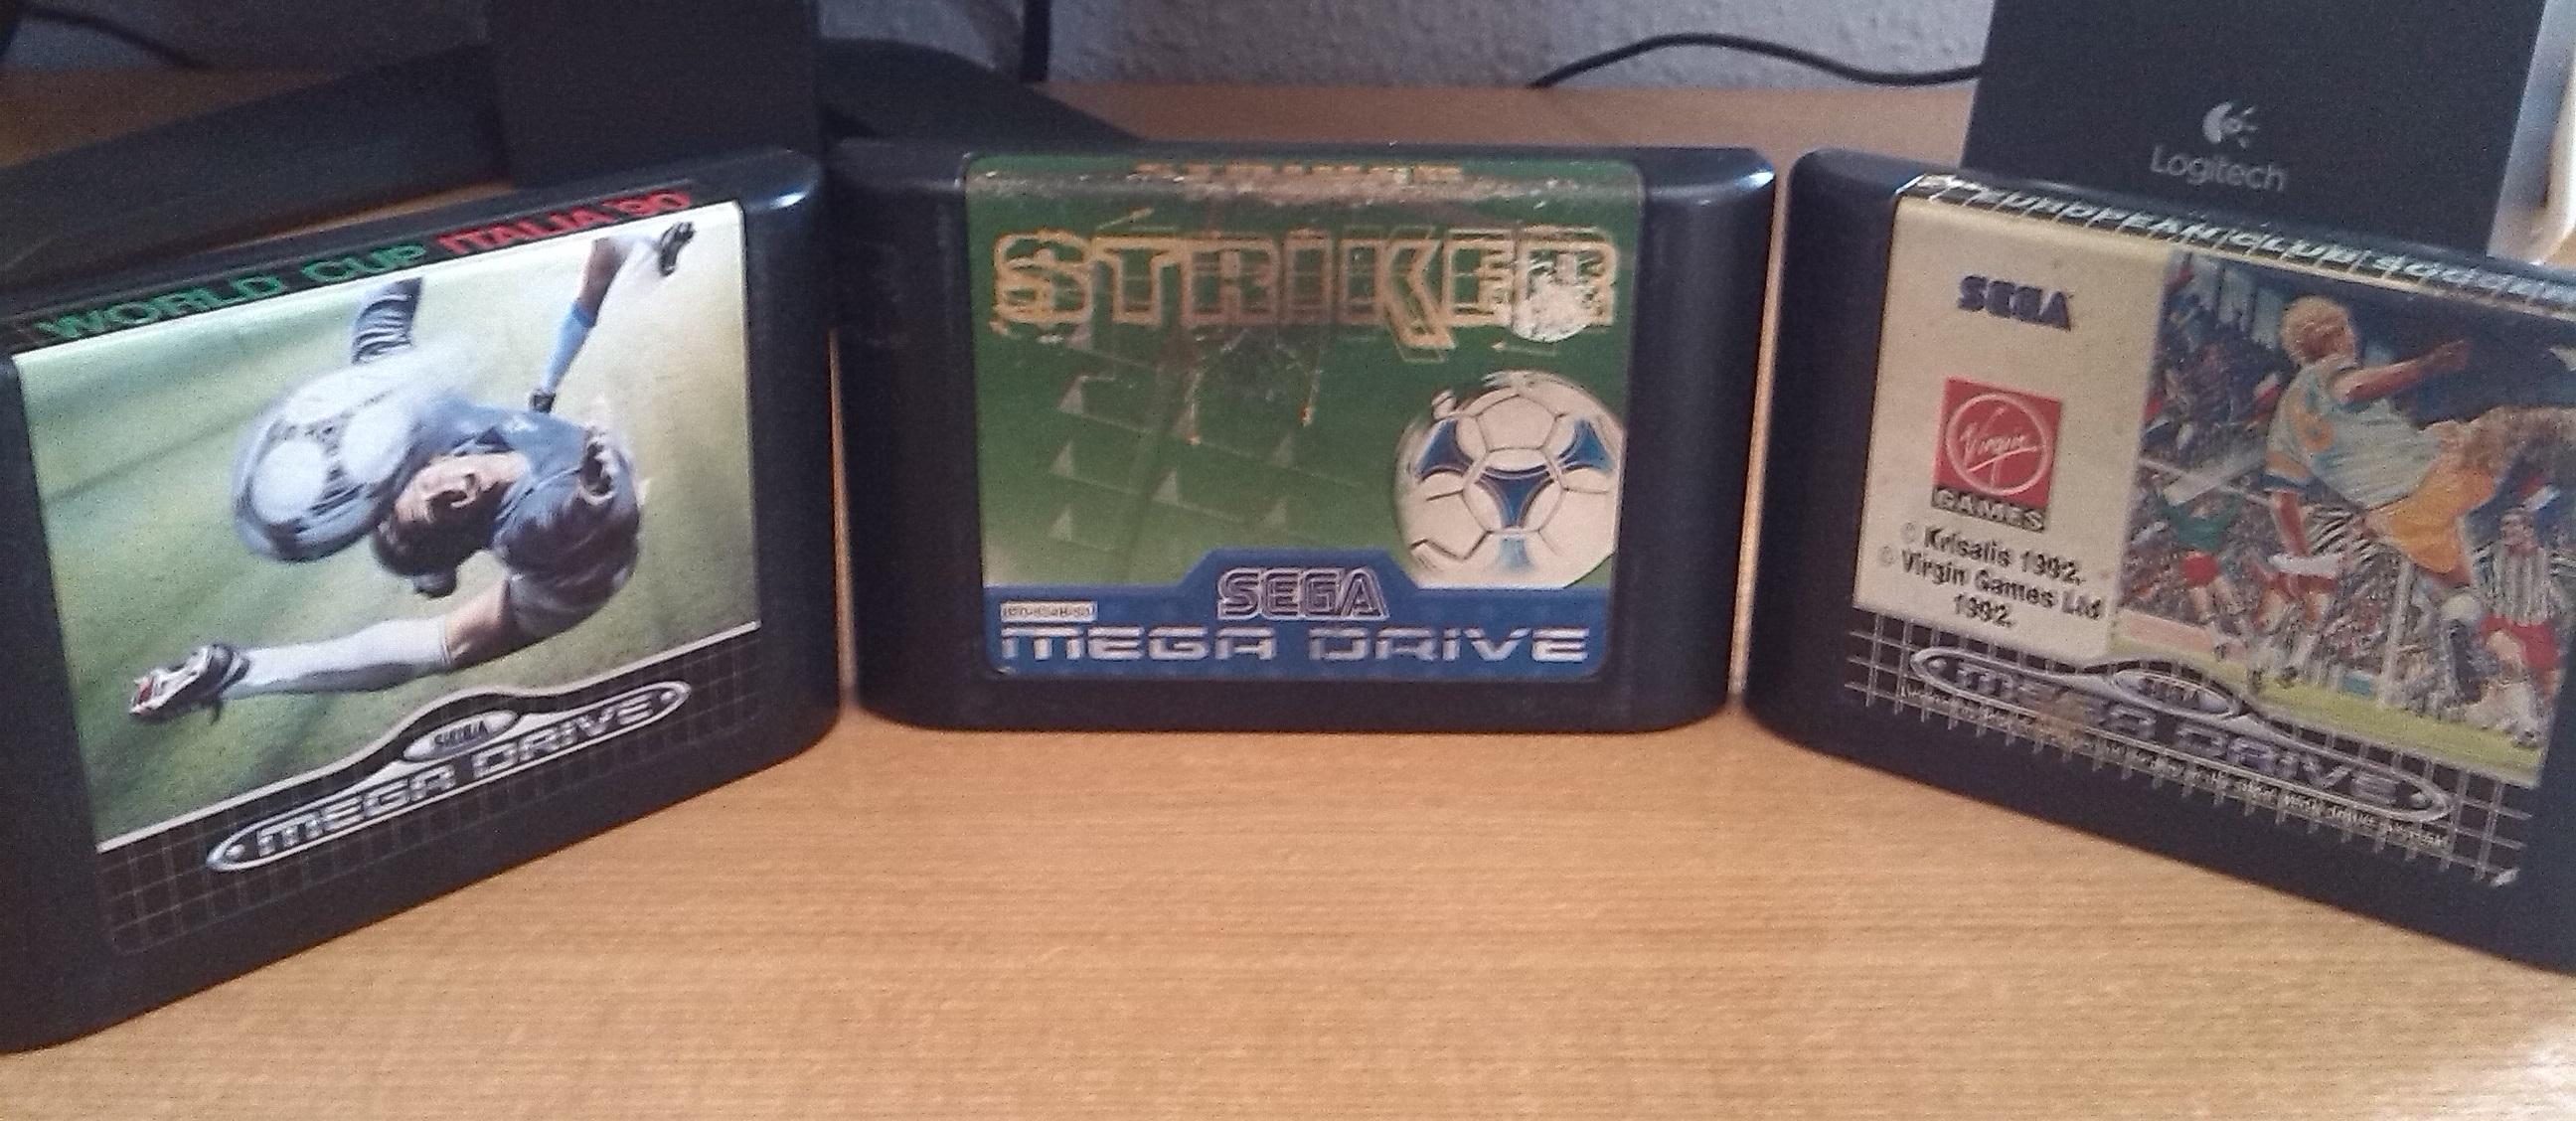 Vendo consola Sega Megadrive 2 + juegos Img_2013